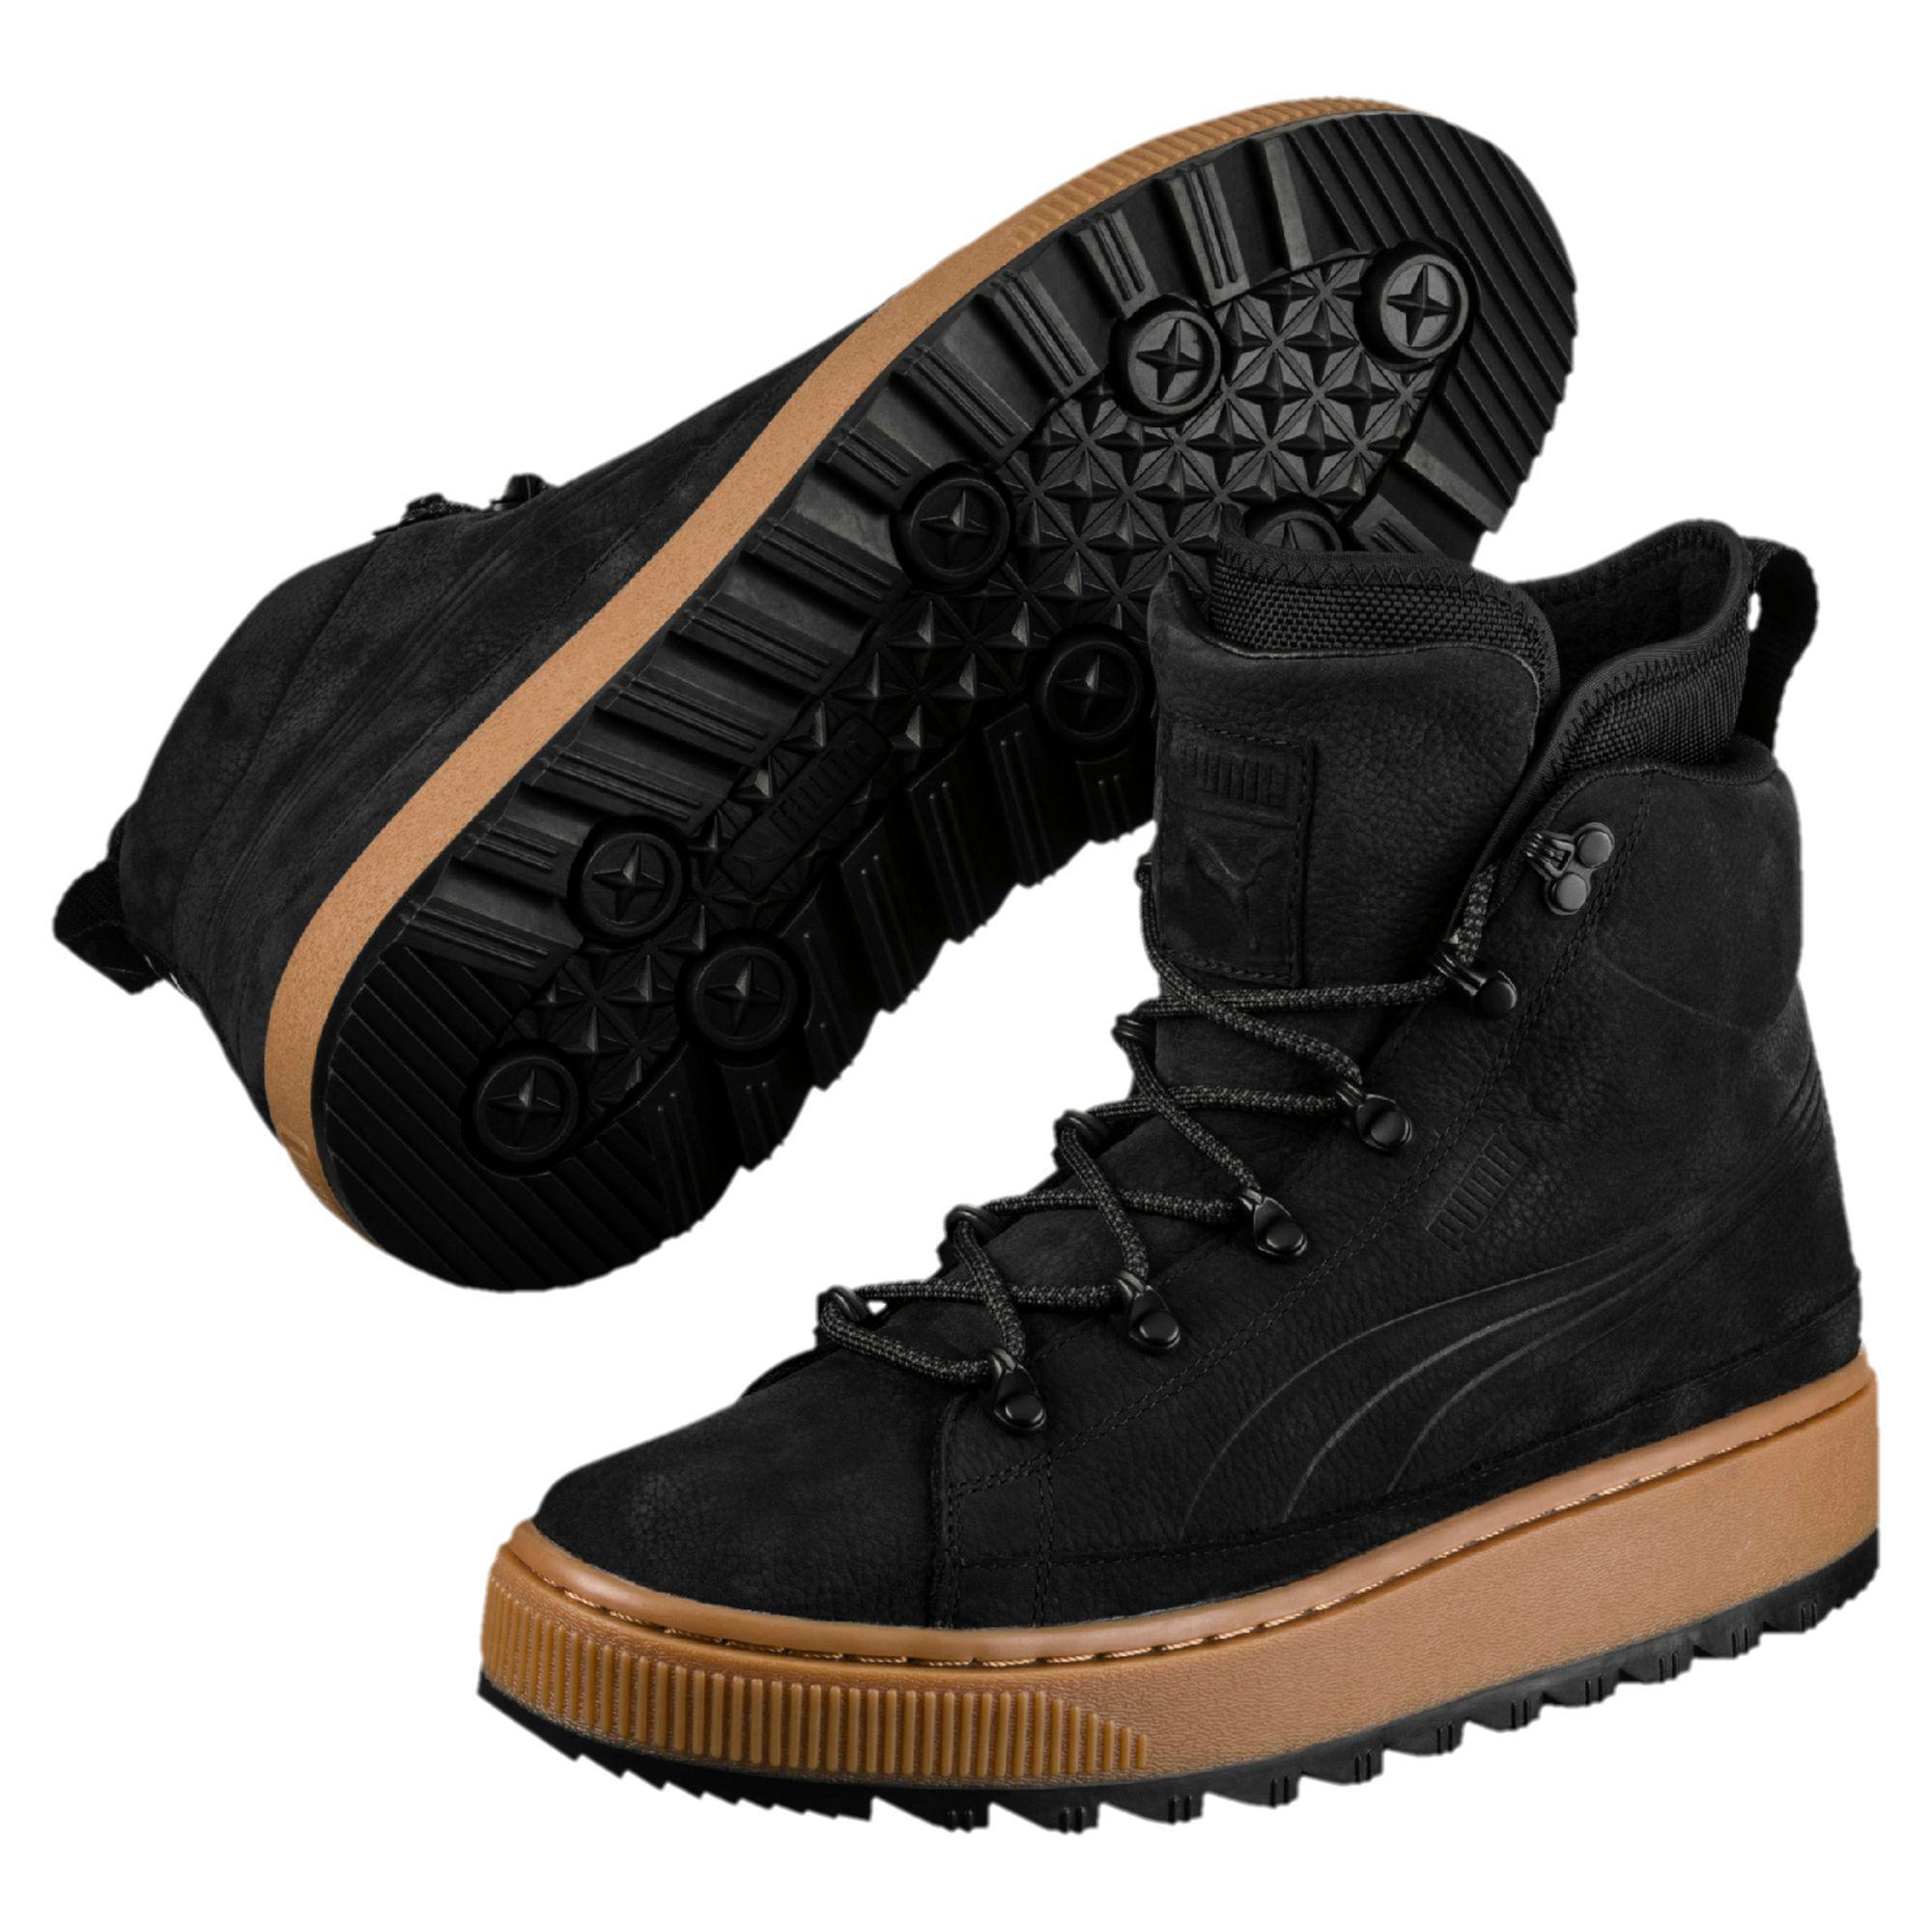 b38d080c06c7 Lyst - PUMA The Ren Boots in Black